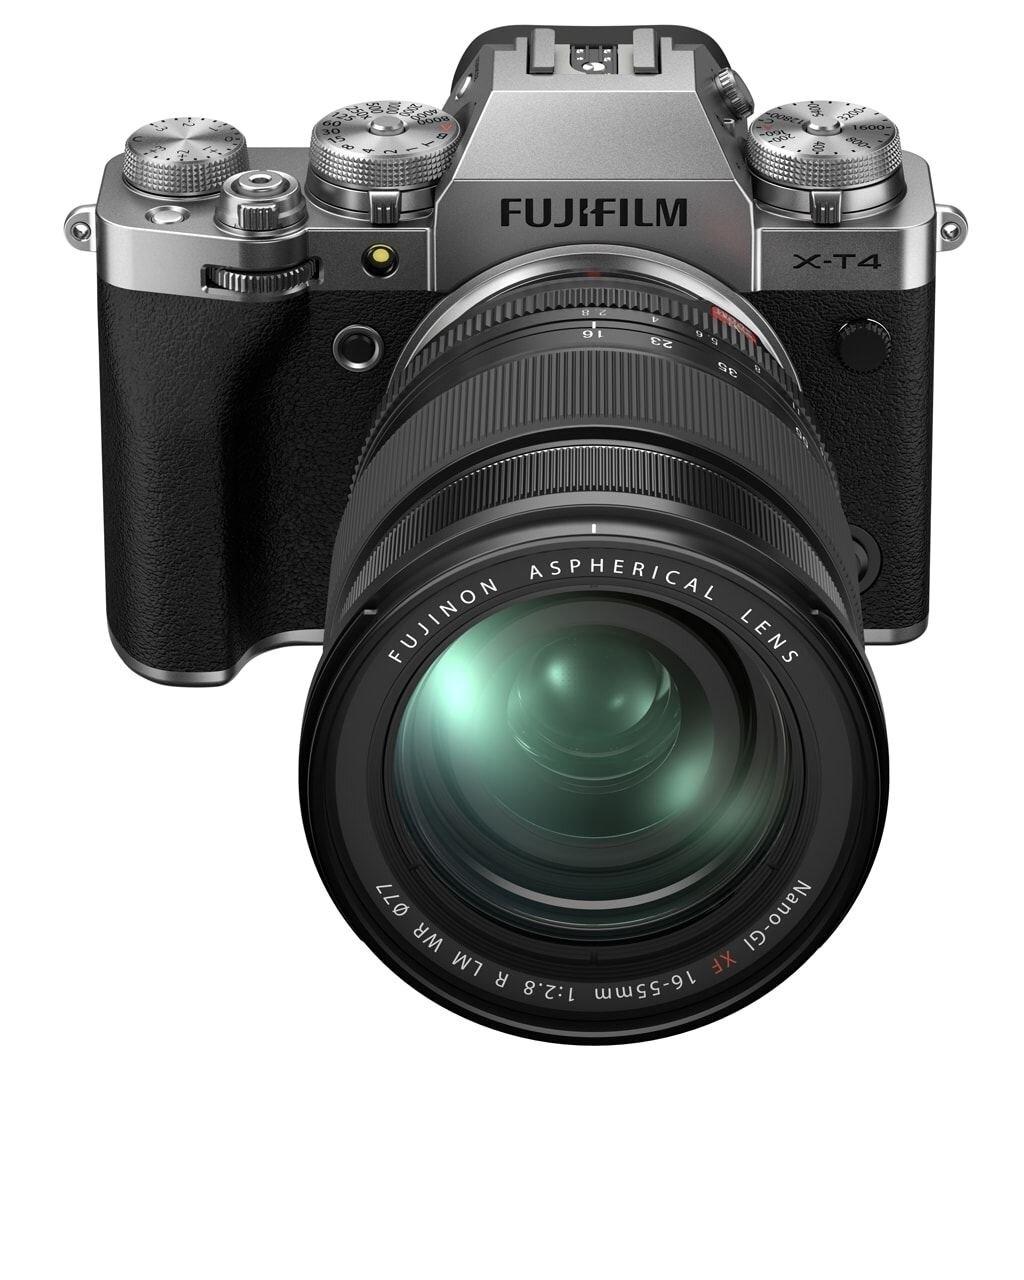 Fujifilm X-T4 silber inkl. XF 16-55mm 1:2,8 R LM WR